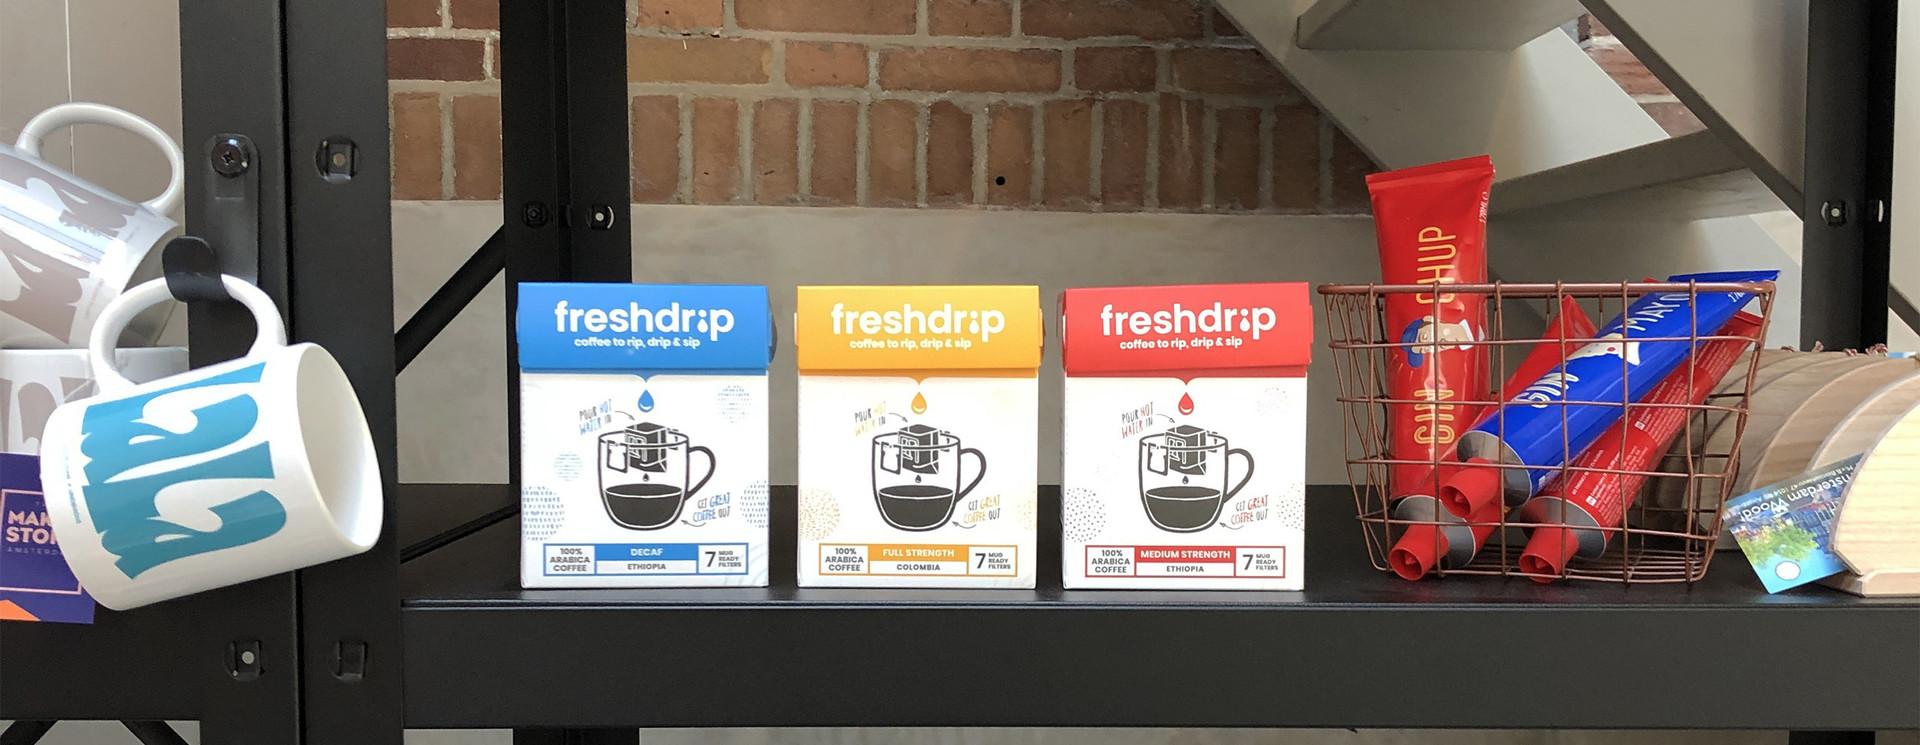 Order Freshdrip by box size